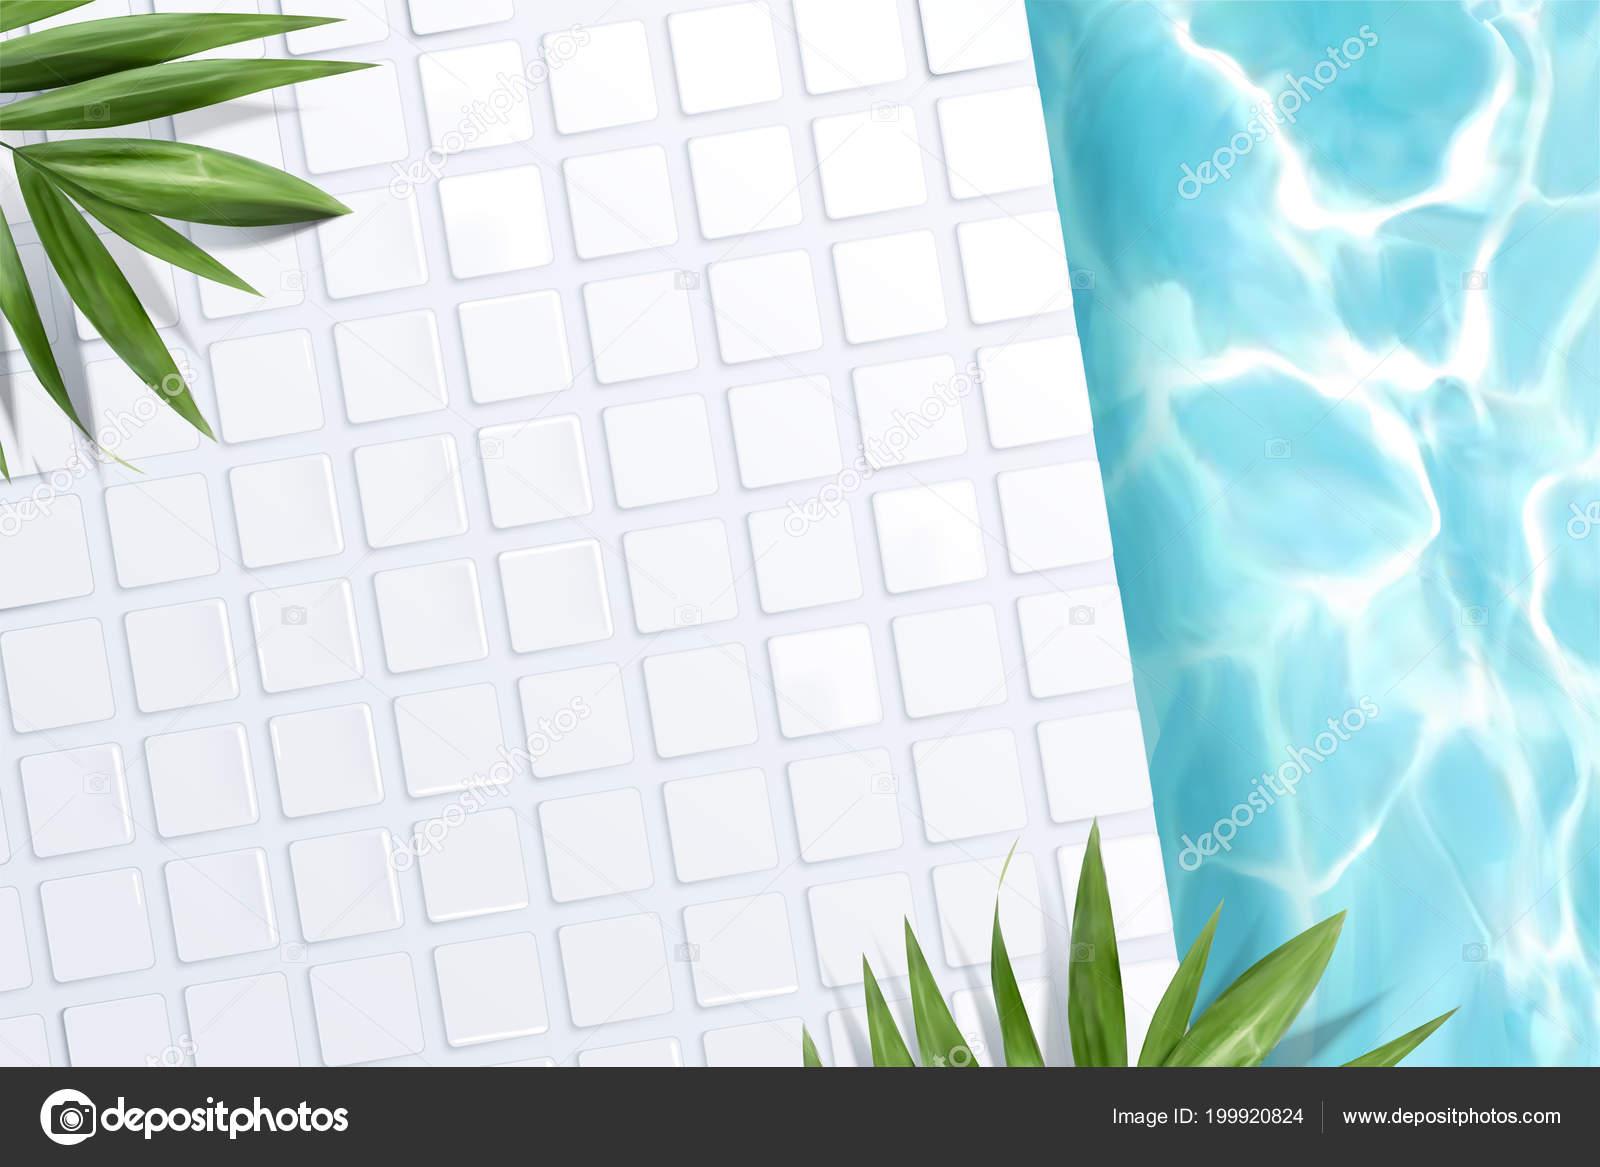 Vue Dessus Scene Piscine Avec Carrelage Blanc Vert Palmier Laisse